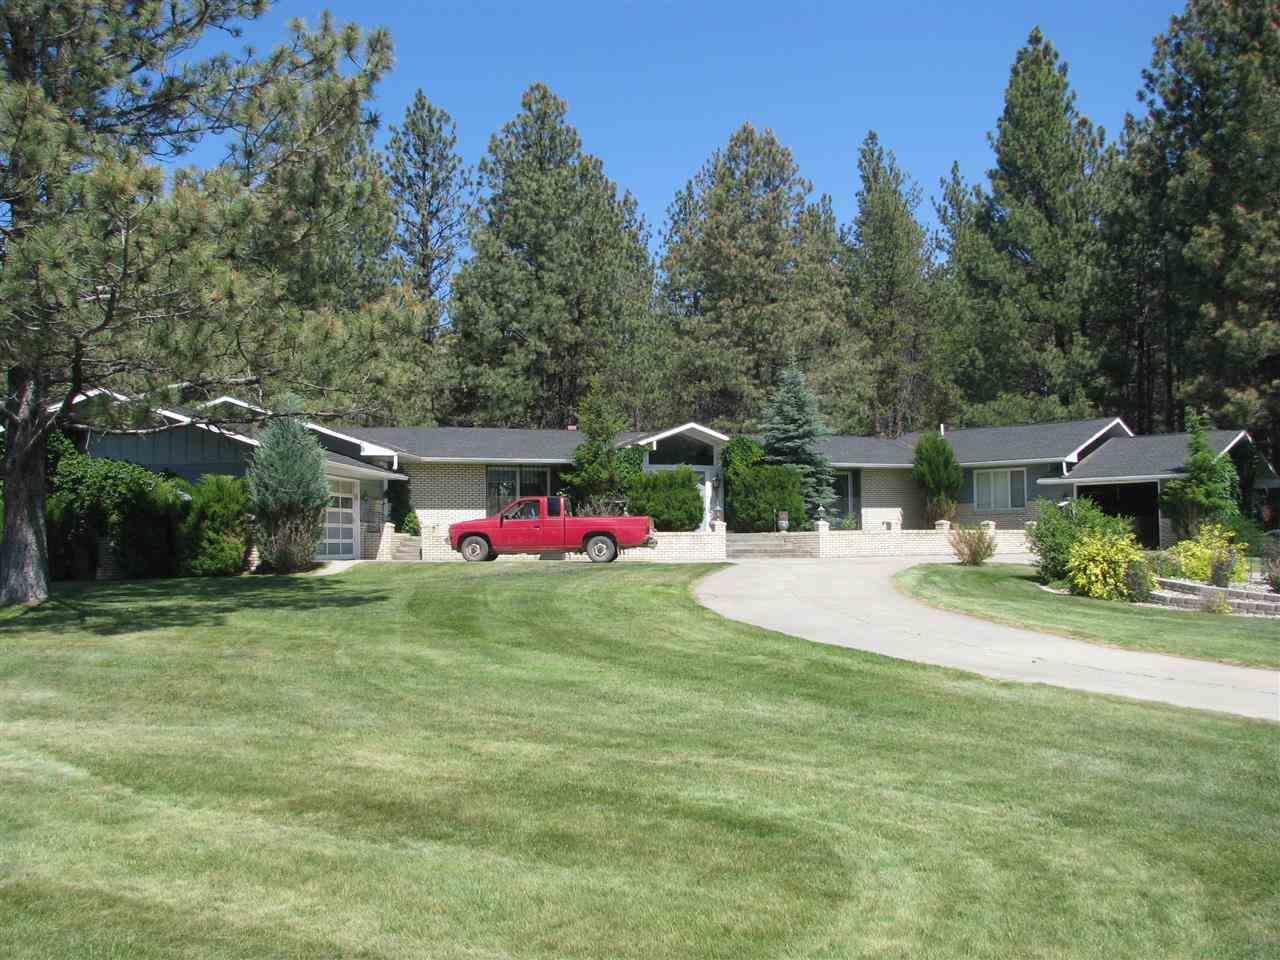 Real Estate for Sale, ListingId: 28938541, Clancy,MT59634